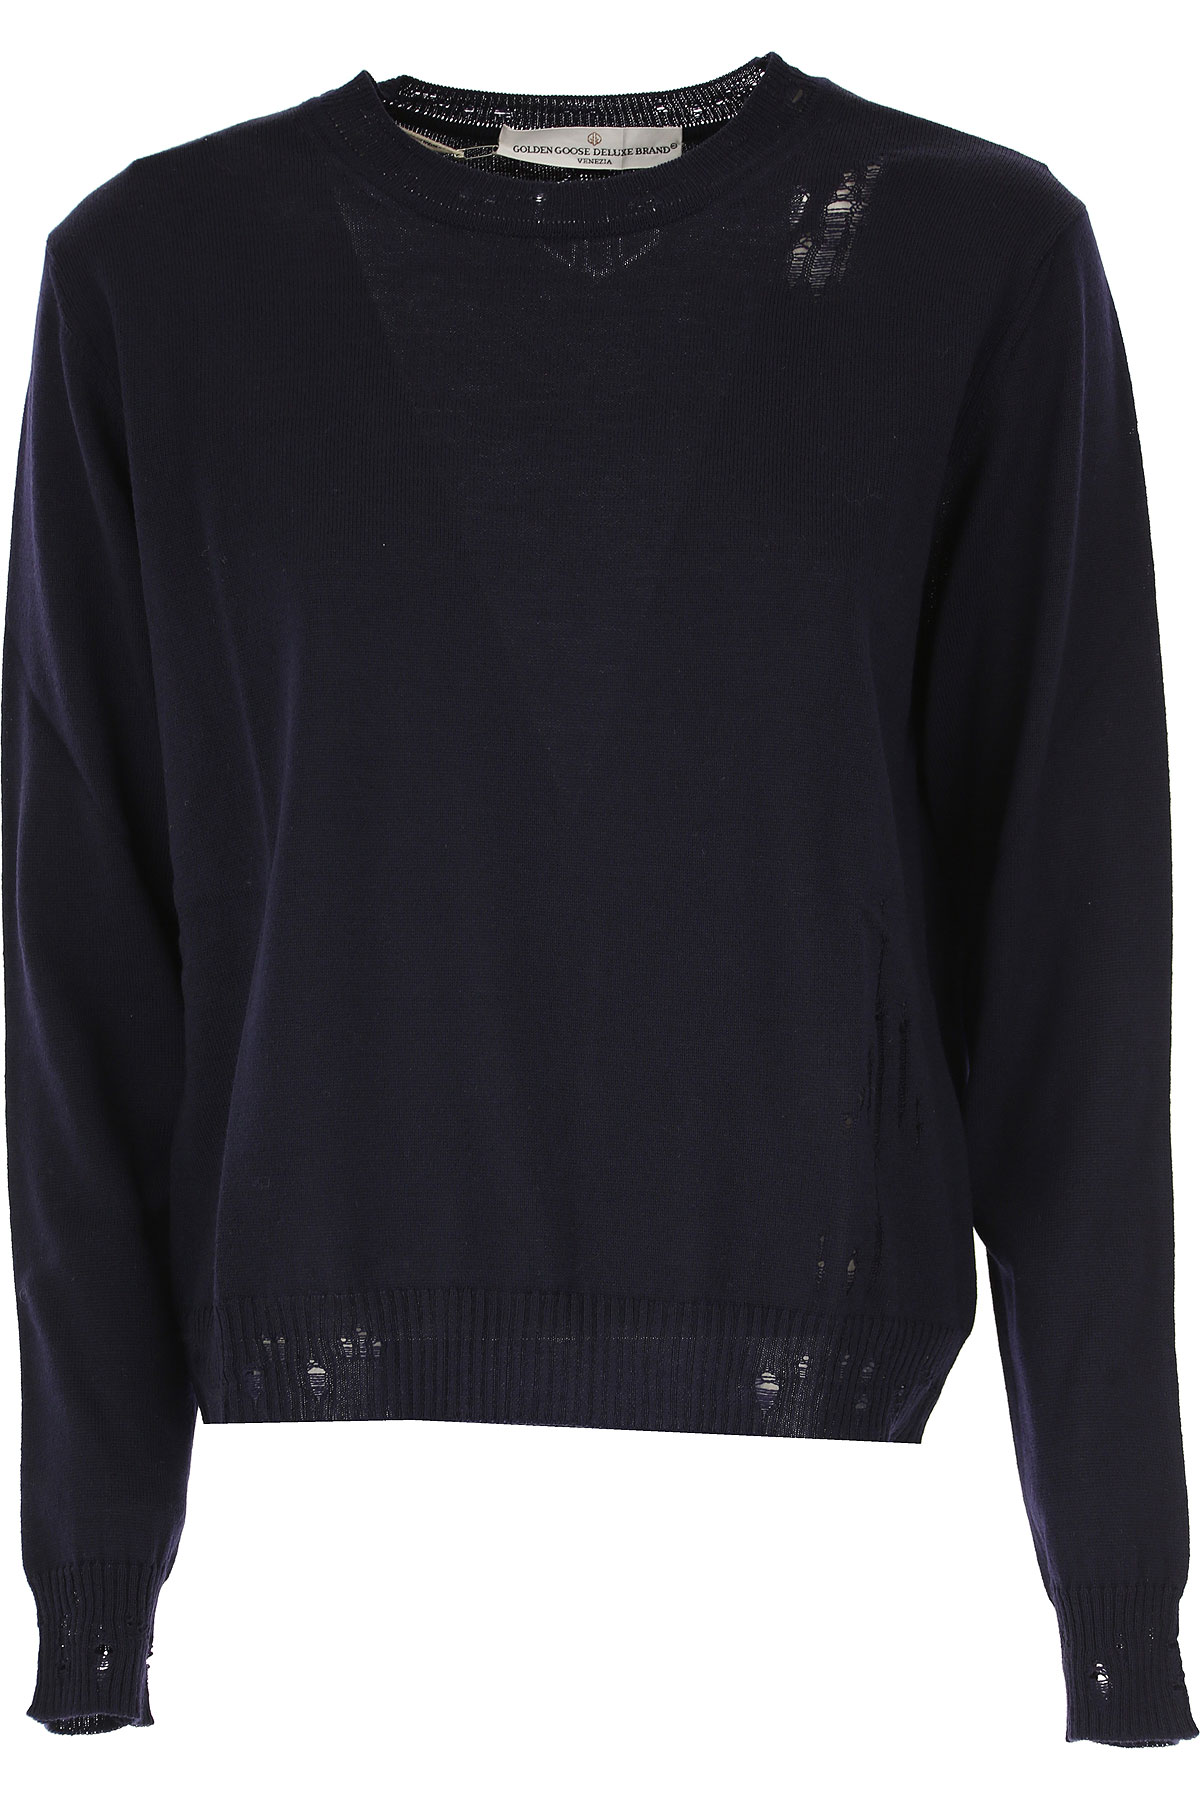 Image of PT05 Jeans, Dark Blue, Cotton, 2017, 24 25 26 27 28 29 30